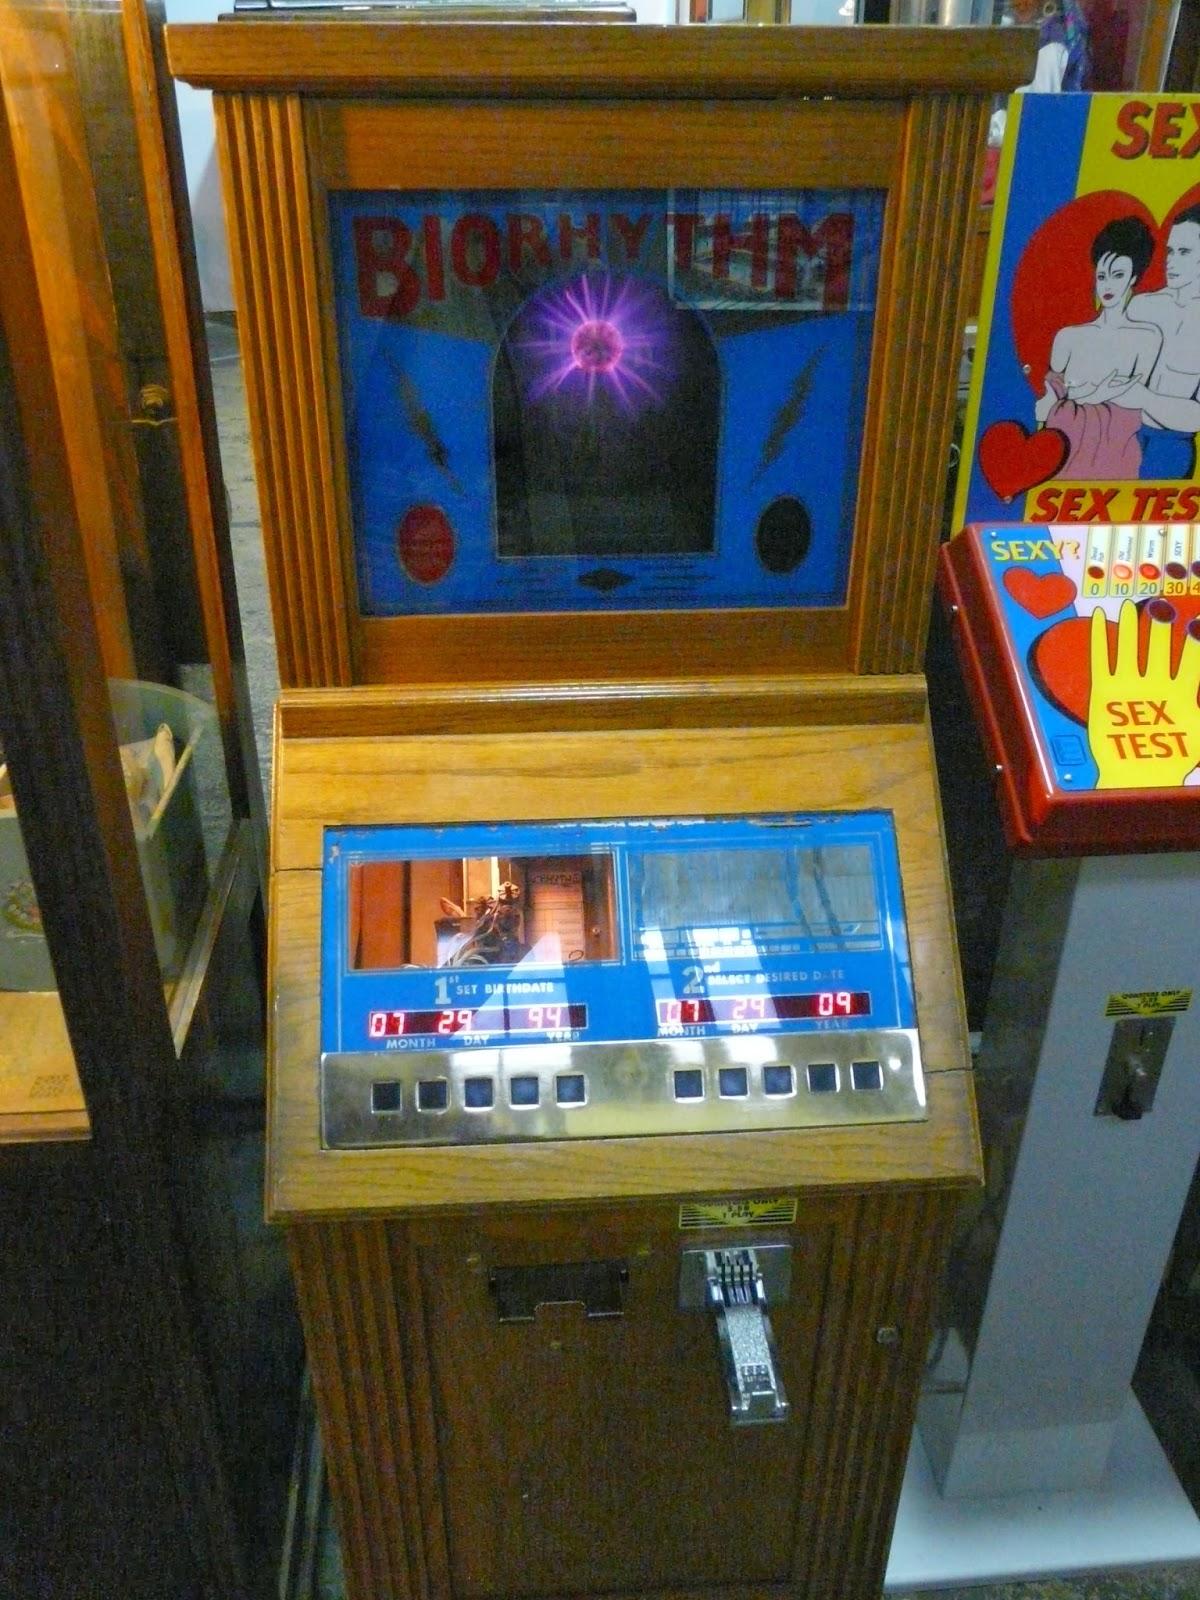 biorhythm machine